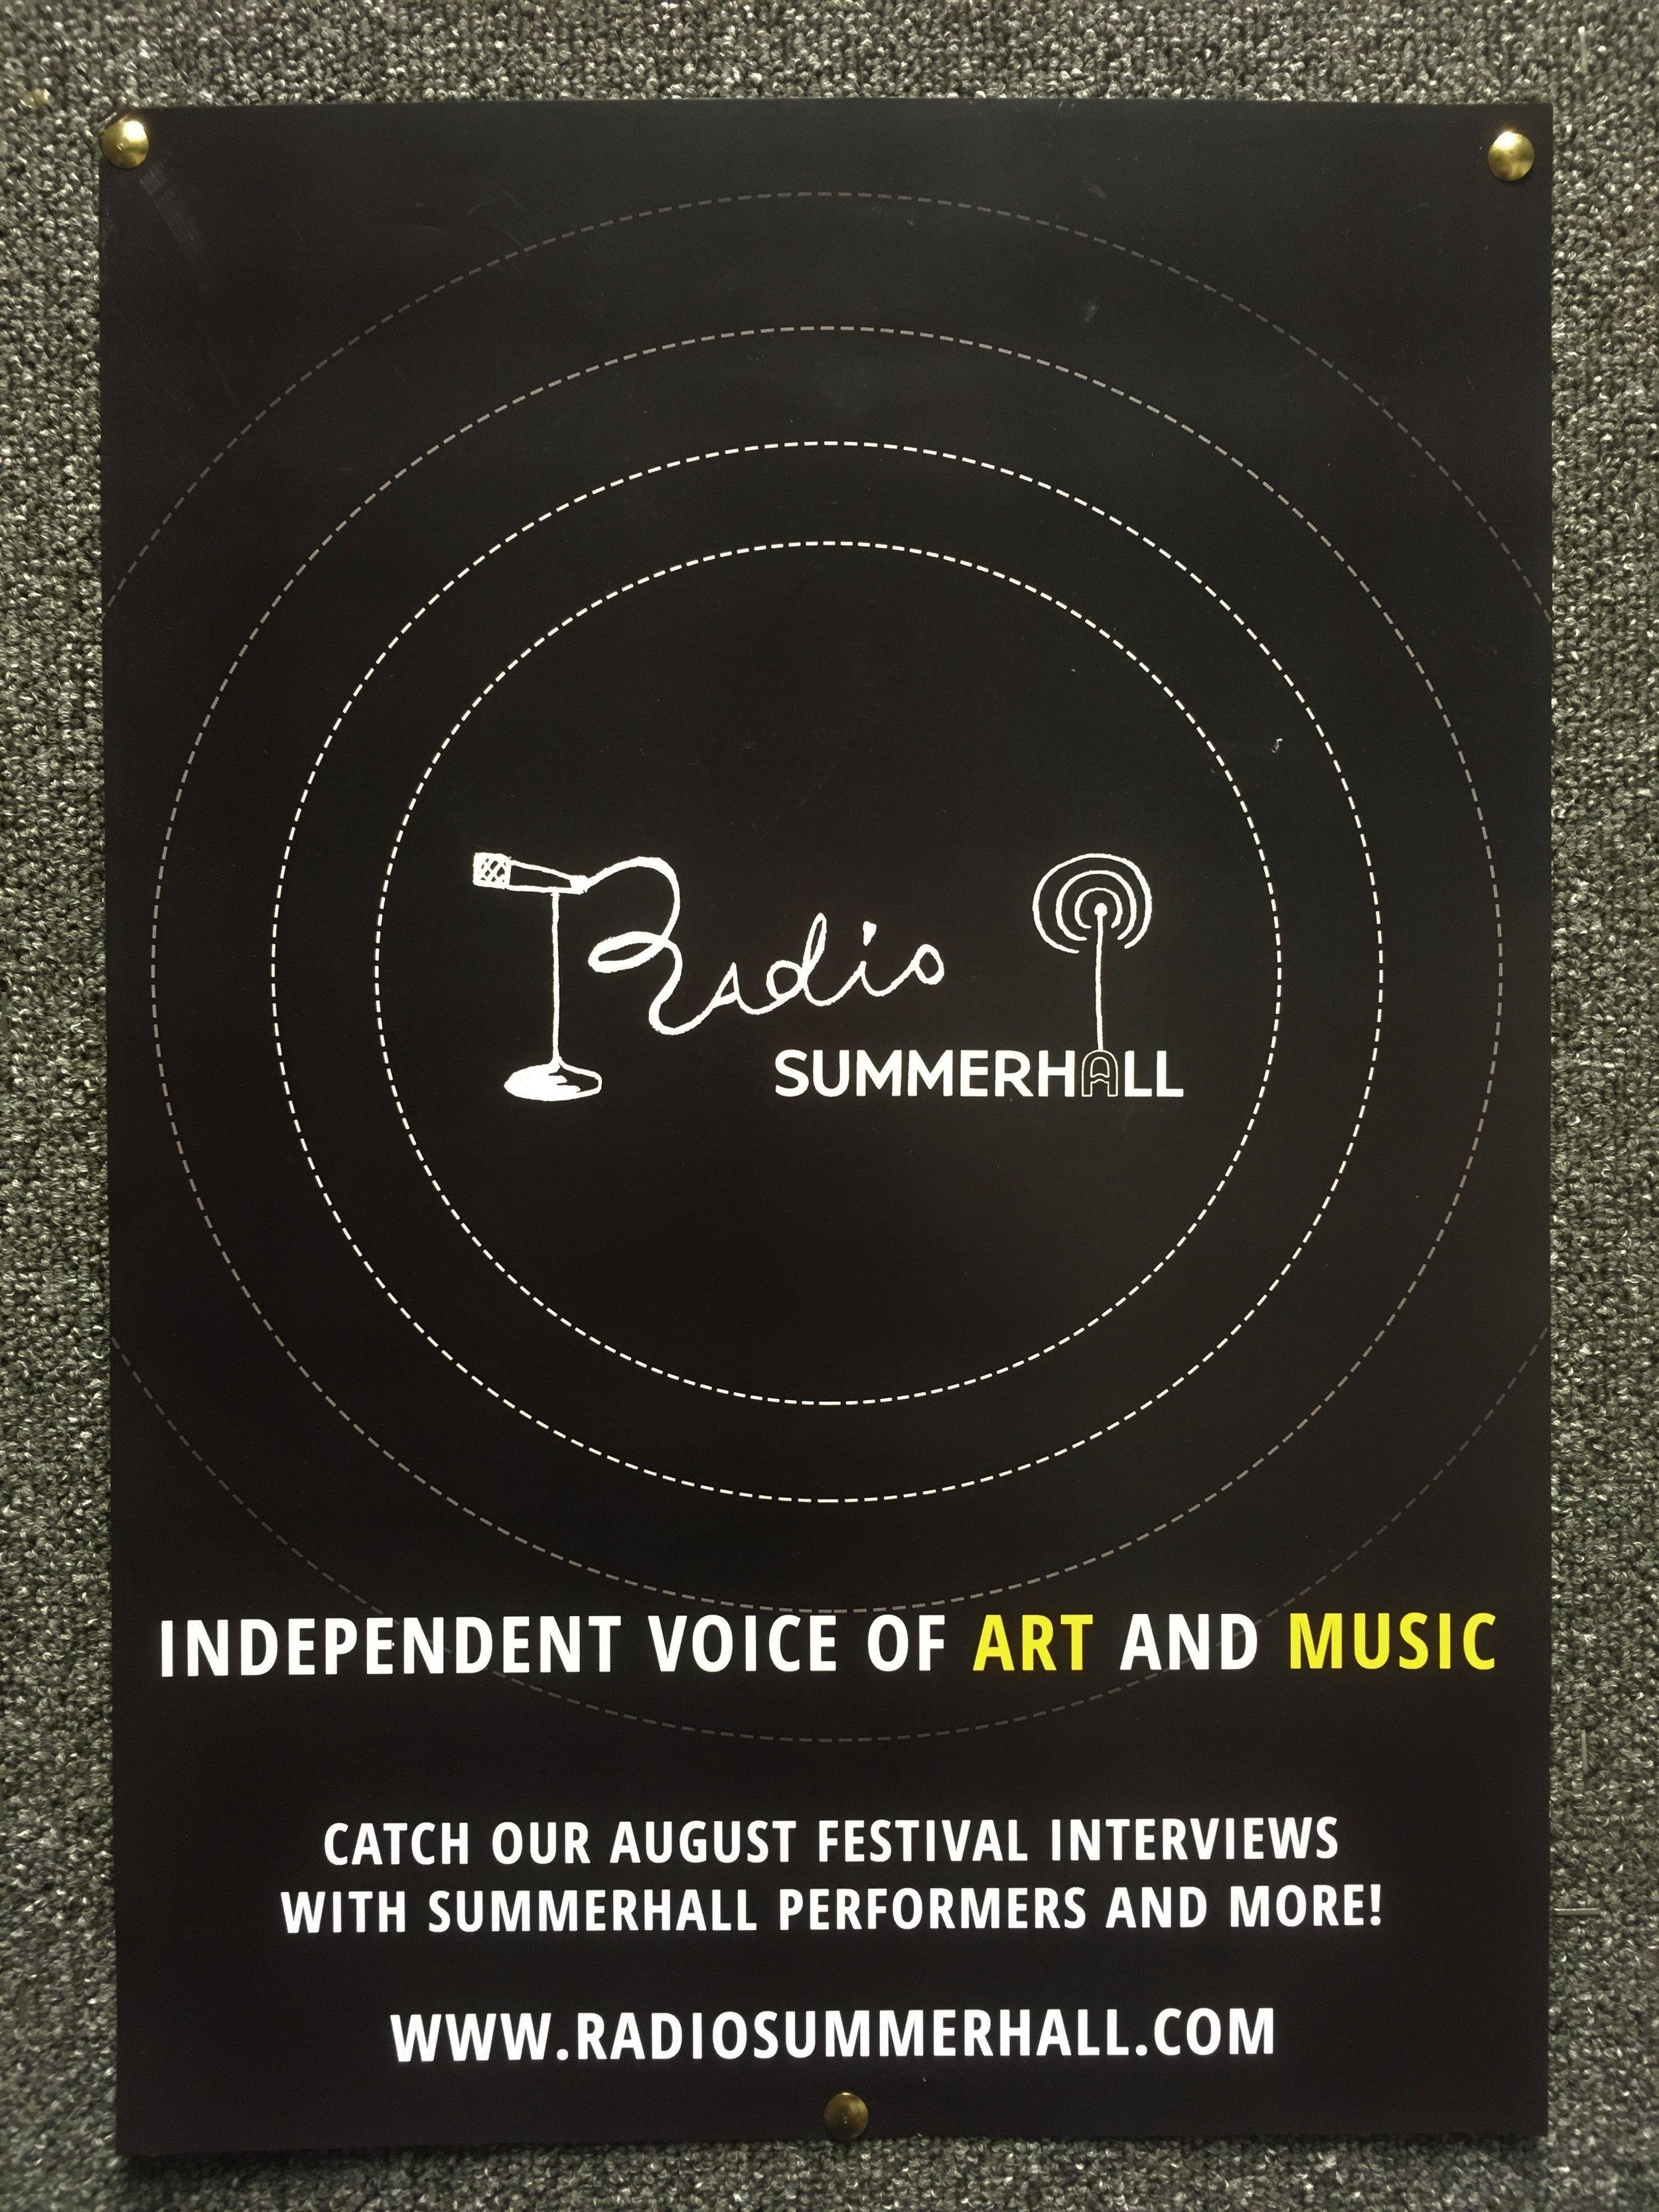 Radio Summerhall Poster.JPG